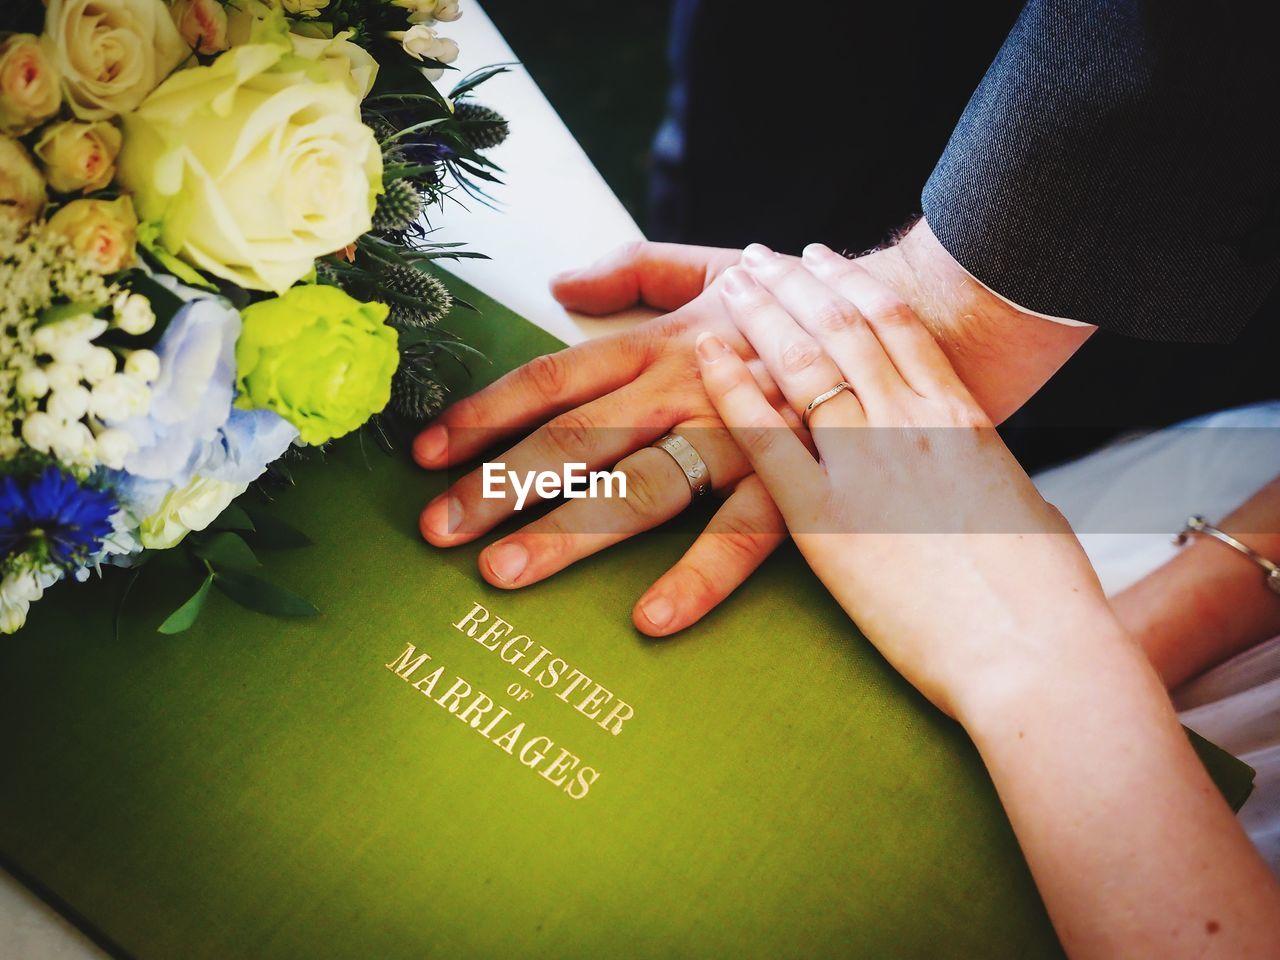 Cropped hands of bride and bridegroom on wedding register